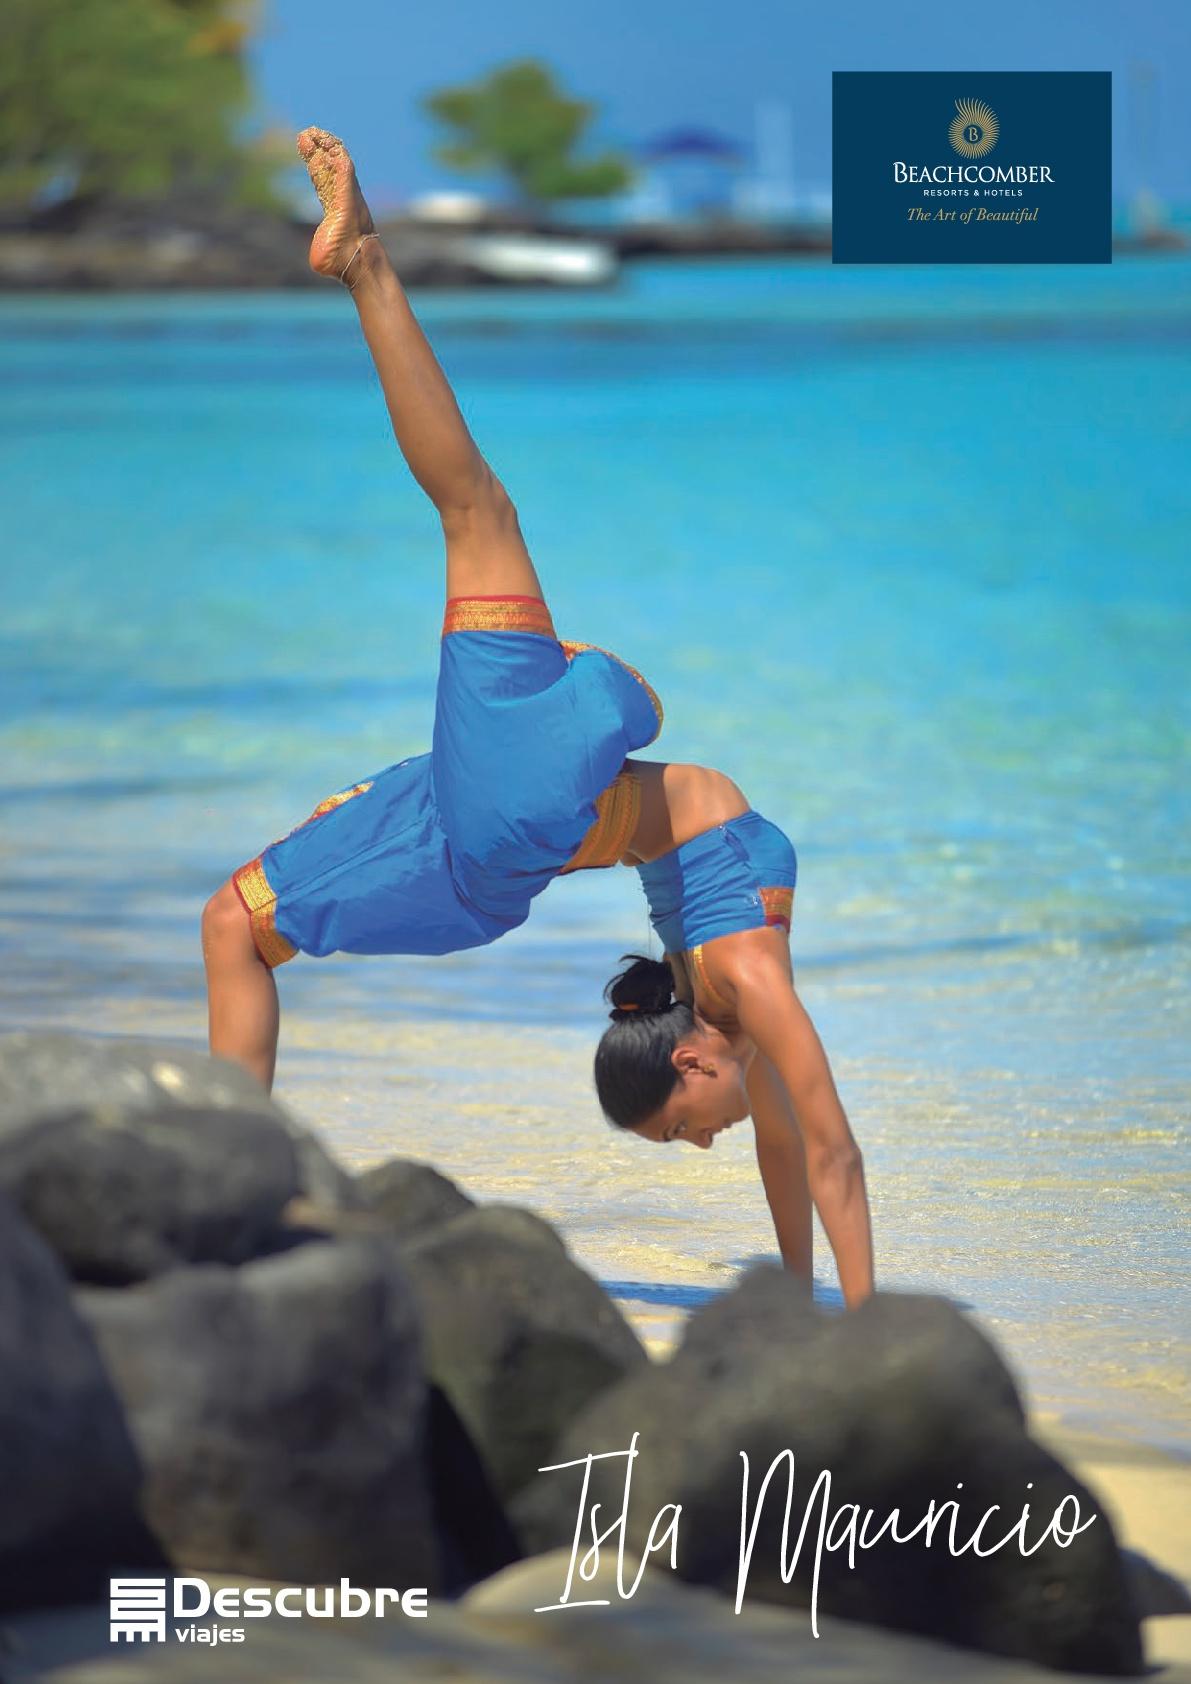 Beachcomber - Isla Mauricio